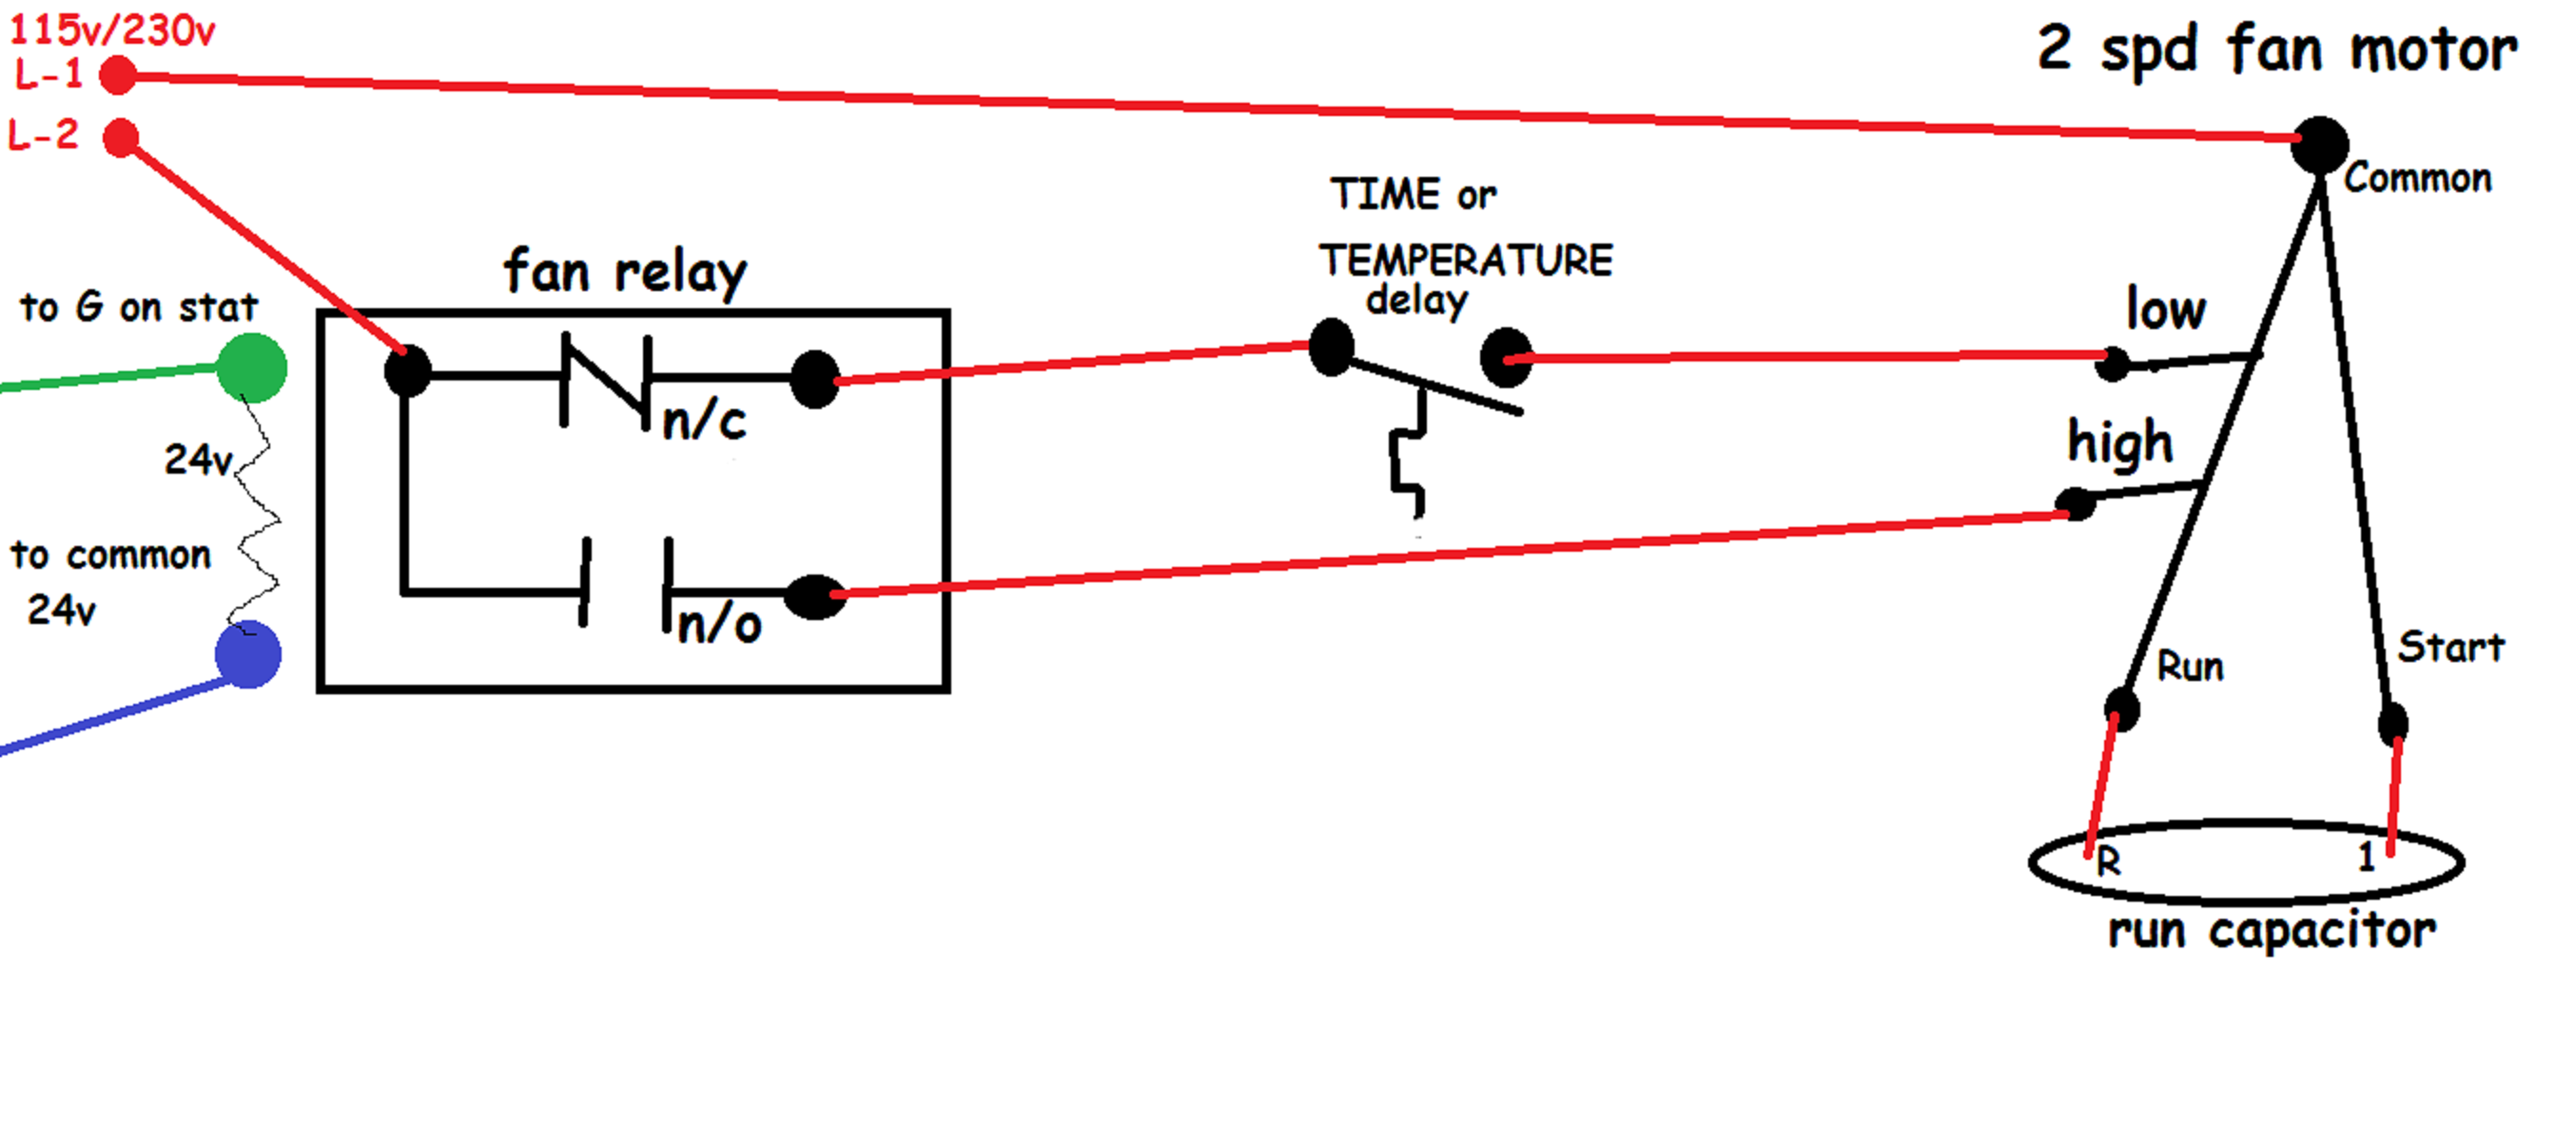 medium resolution of unique fan relay wiring diagram hvac diagram diagramsampleunique fan relay wiring diagram hvac diagram diagramsample diagramtemplate